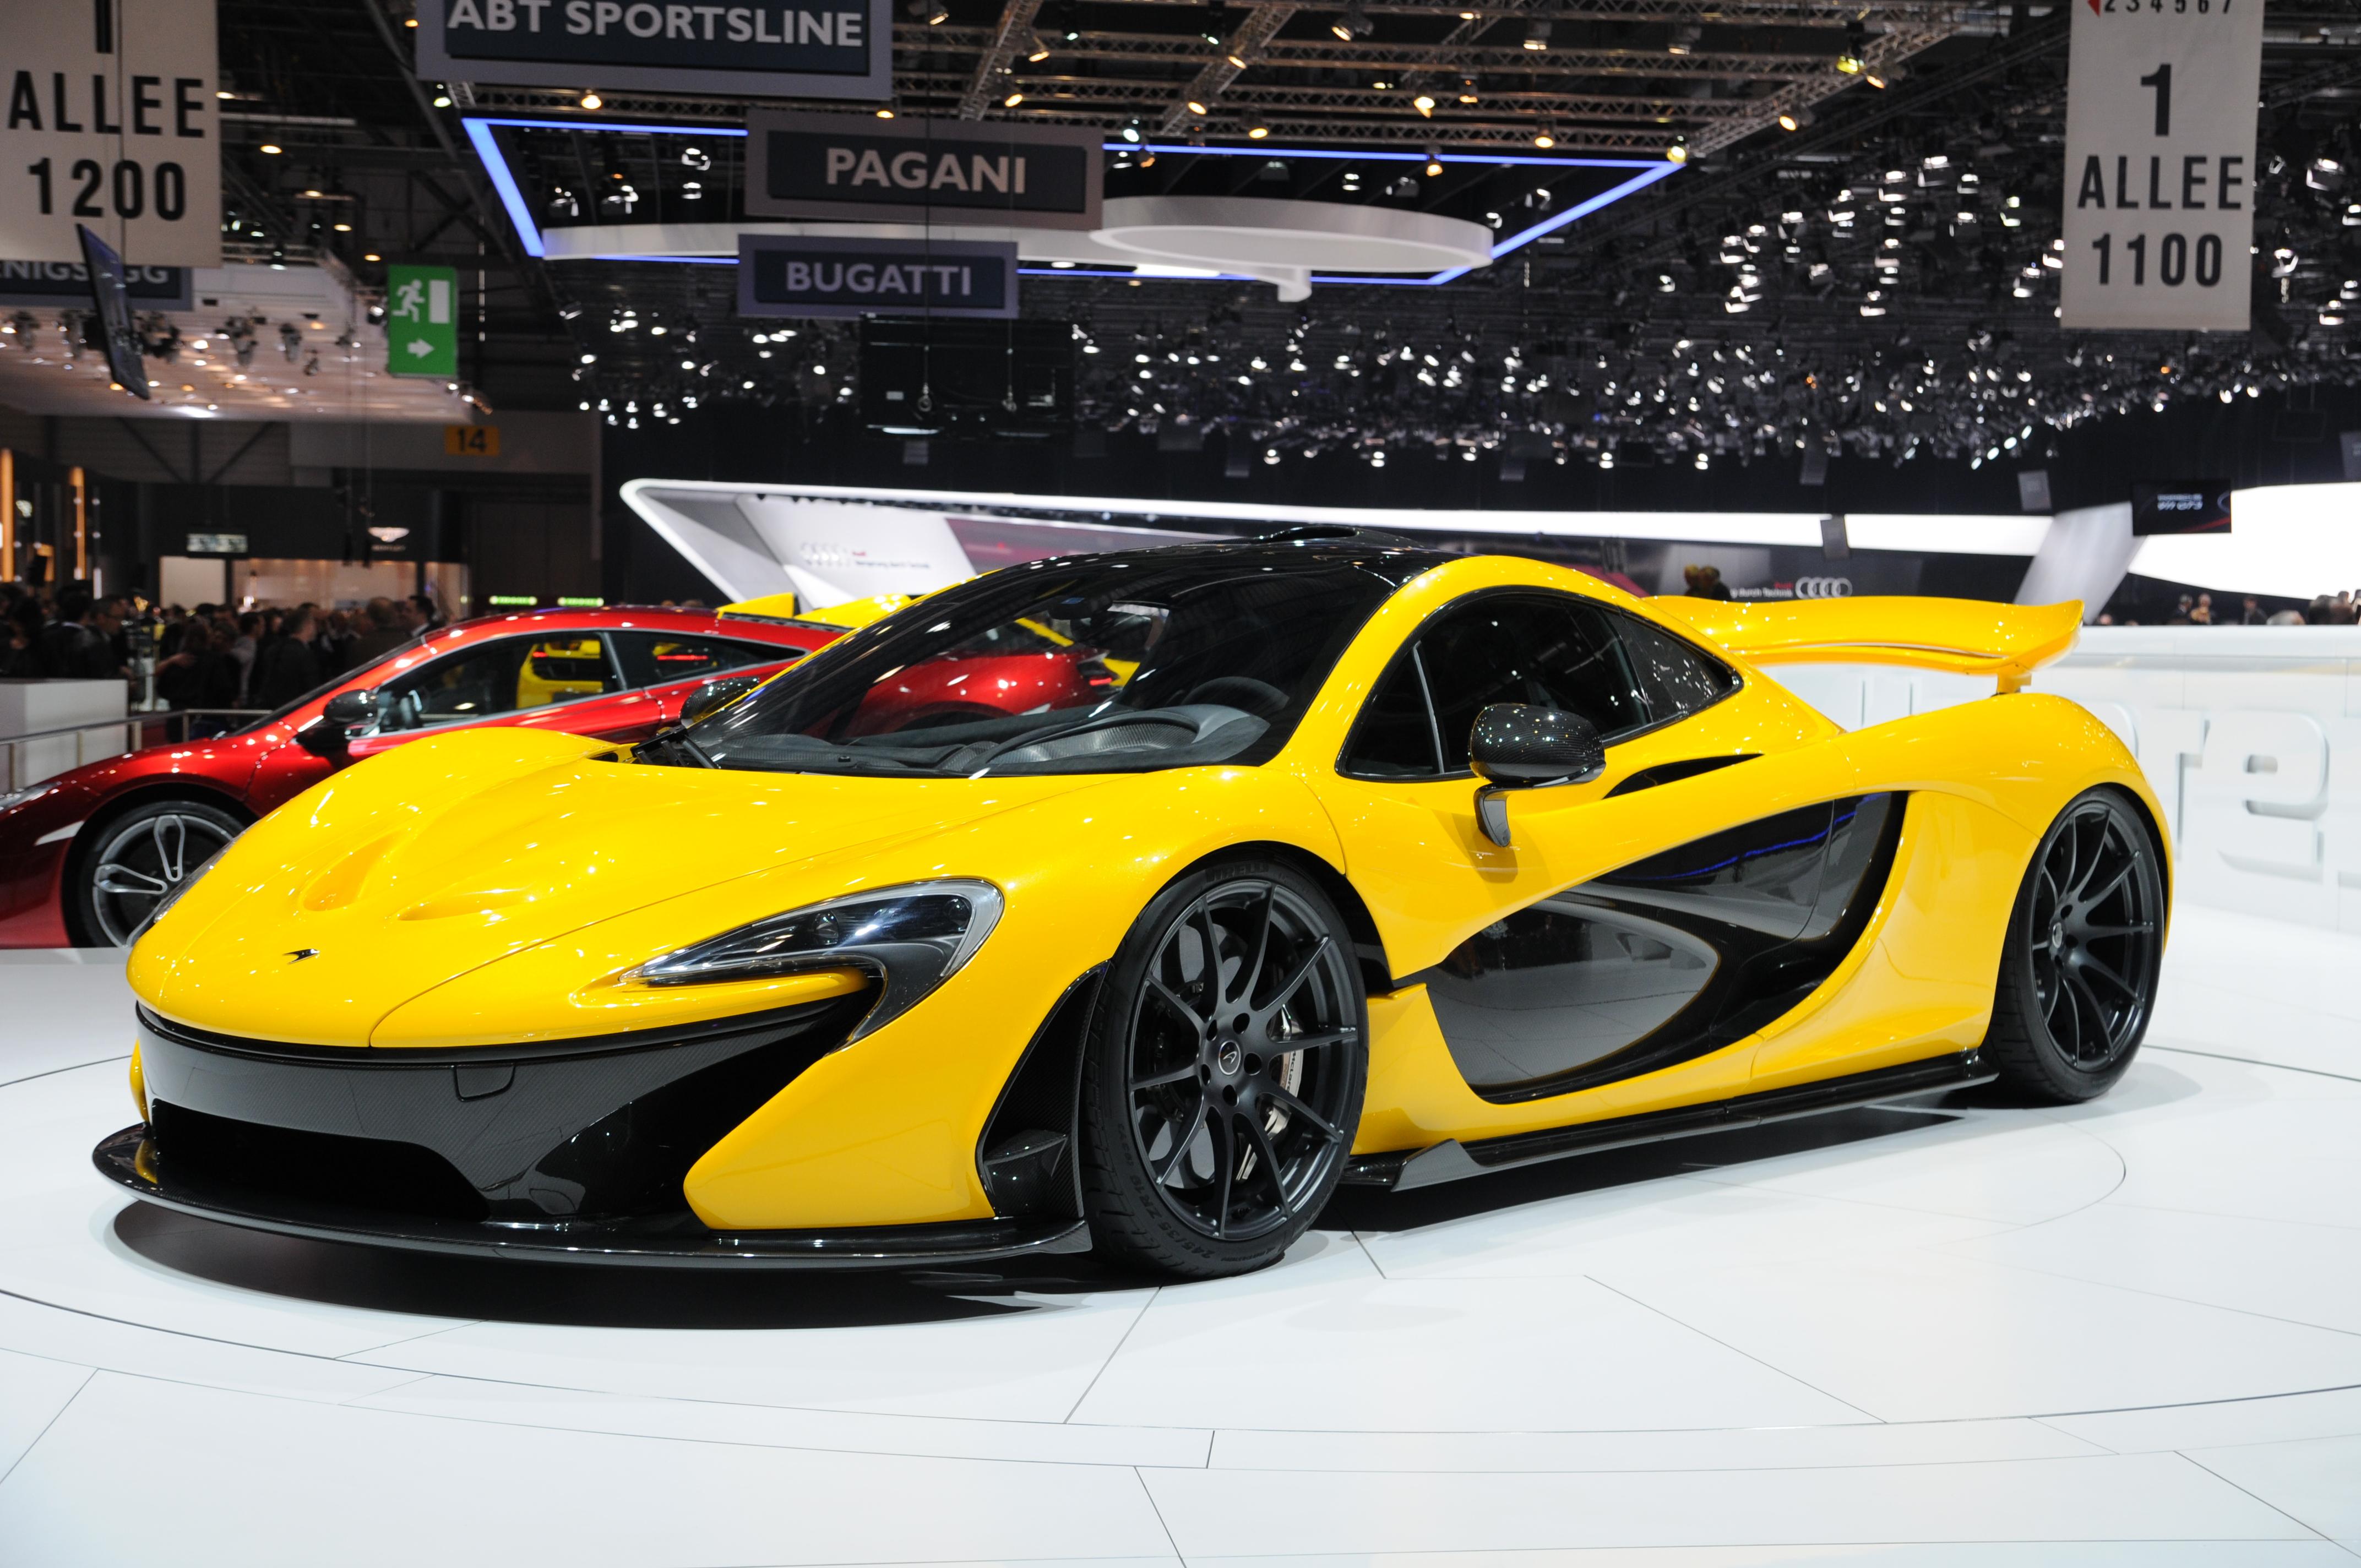 https://upload.wikimedia.org/wikipedia/commons/0/0f/2013-03-05_Geneva_Motor_Show_7846.JPG